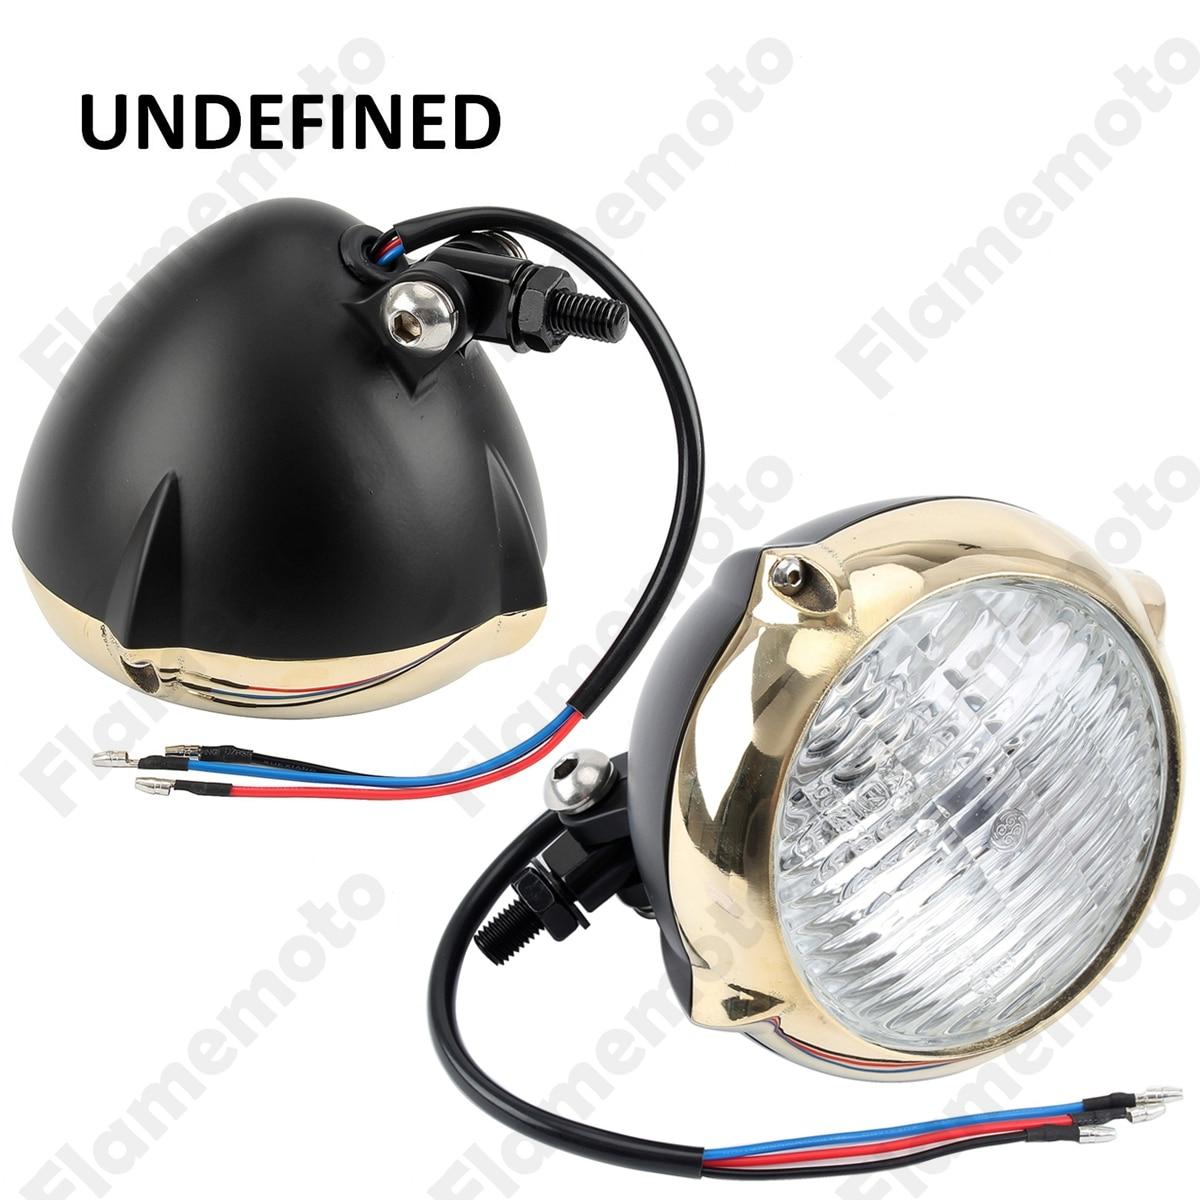 Motorcycle Accessories Black Copper Ring Vintage Bullet Motorbike Headlight Lamp For Bobber Chopper Custom UNDEFINED